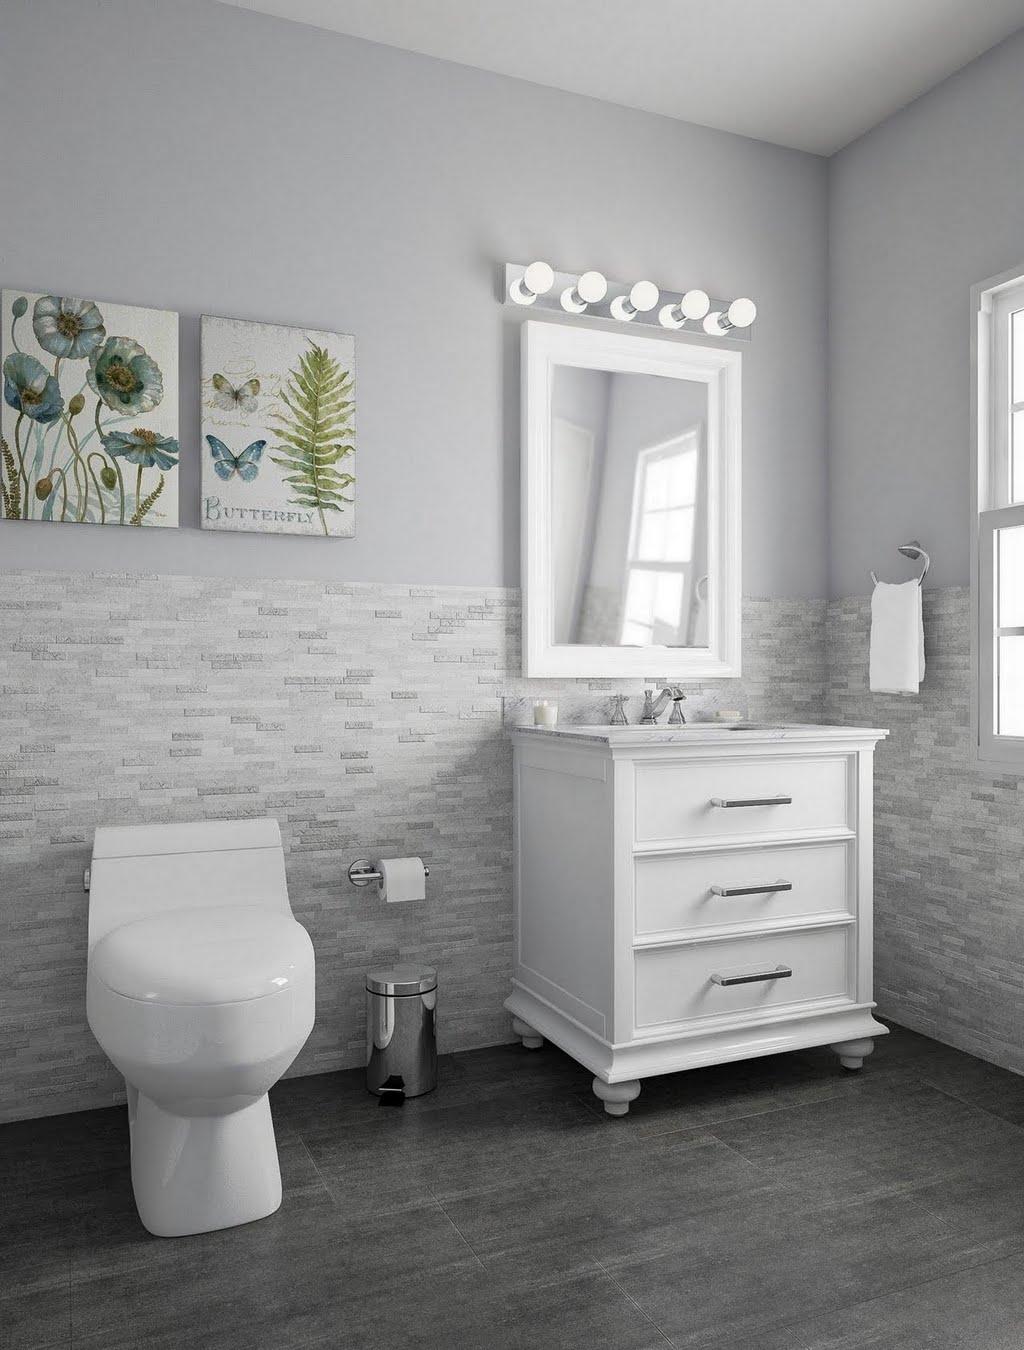 Wainscoting A Bathroom on drywall a bathroom, wallpaper a bathroom, paneling a bathroom, wallpapering a bathroom, tile a bathroom, beadboard paneling bathroom, stenciling a bathroom, waynes coating small bathroom, beadboard a bathroom, plumbing a bathroom, framing a bathroom, paint a bathroom, lighting a bathroom, bathroom a bathroom, remodeling a bathroom,